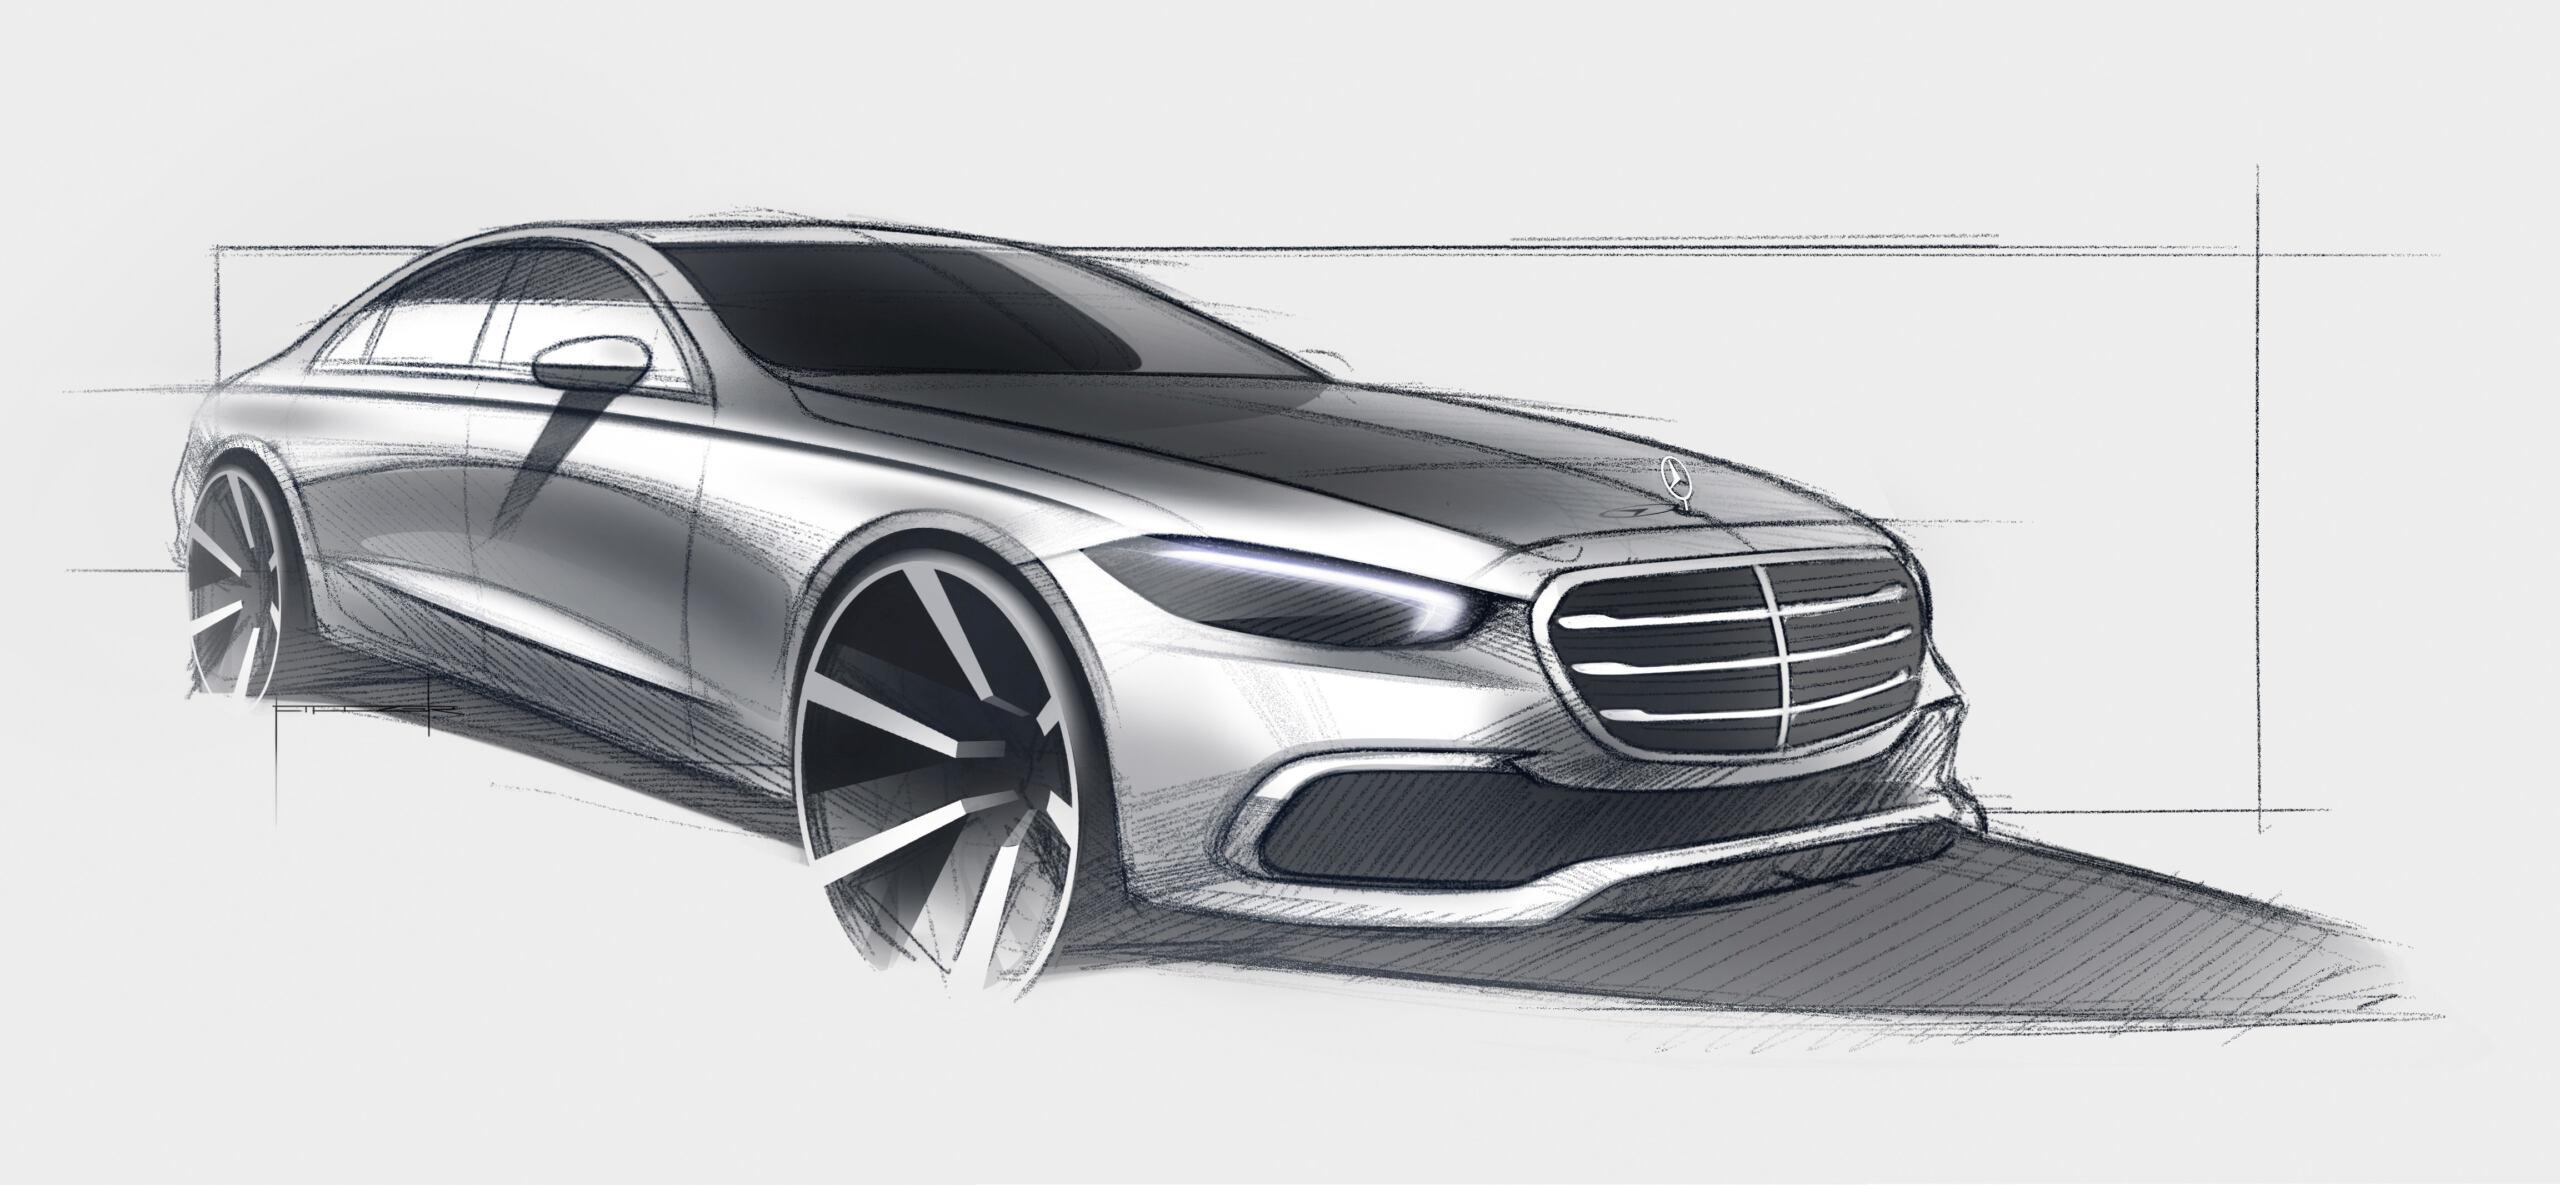 Nuova Mercedes Classe S ultimo teaser